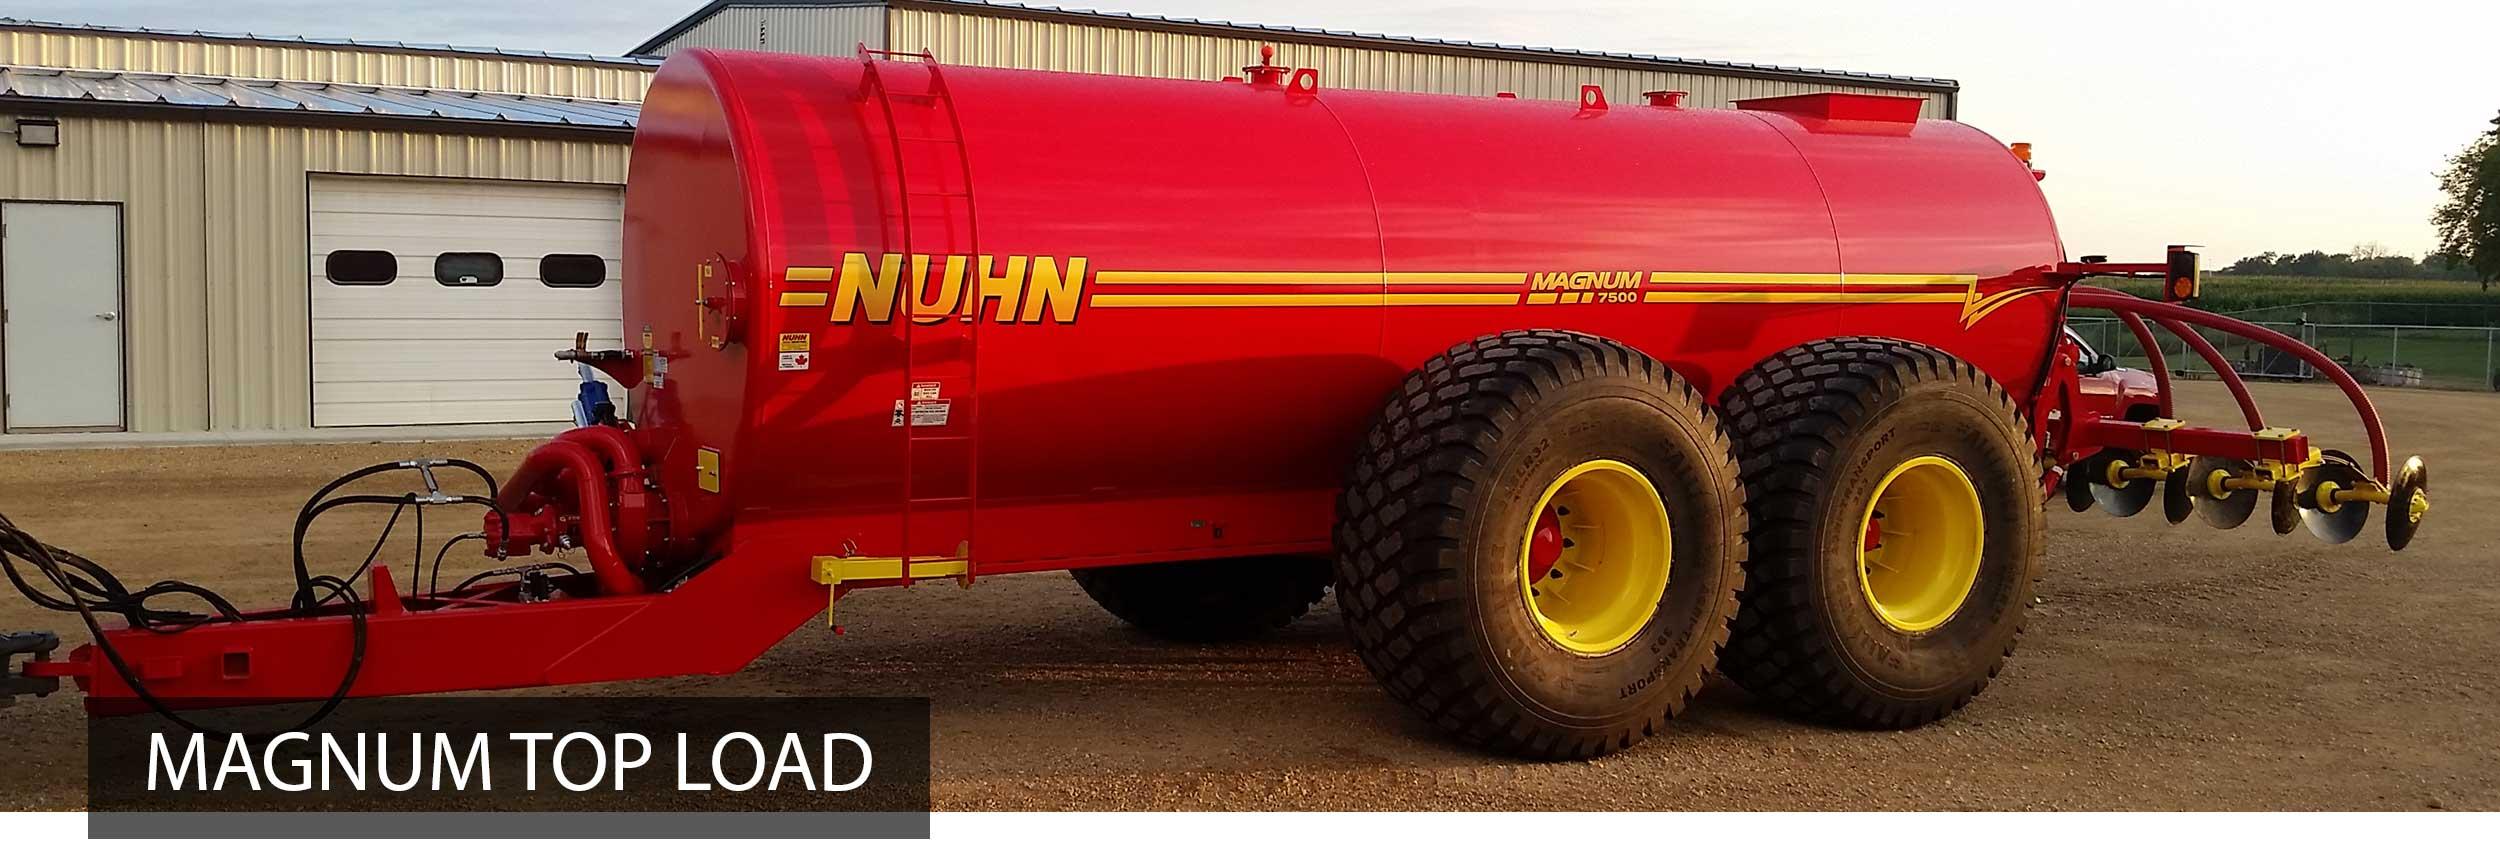 Magnum Top Load